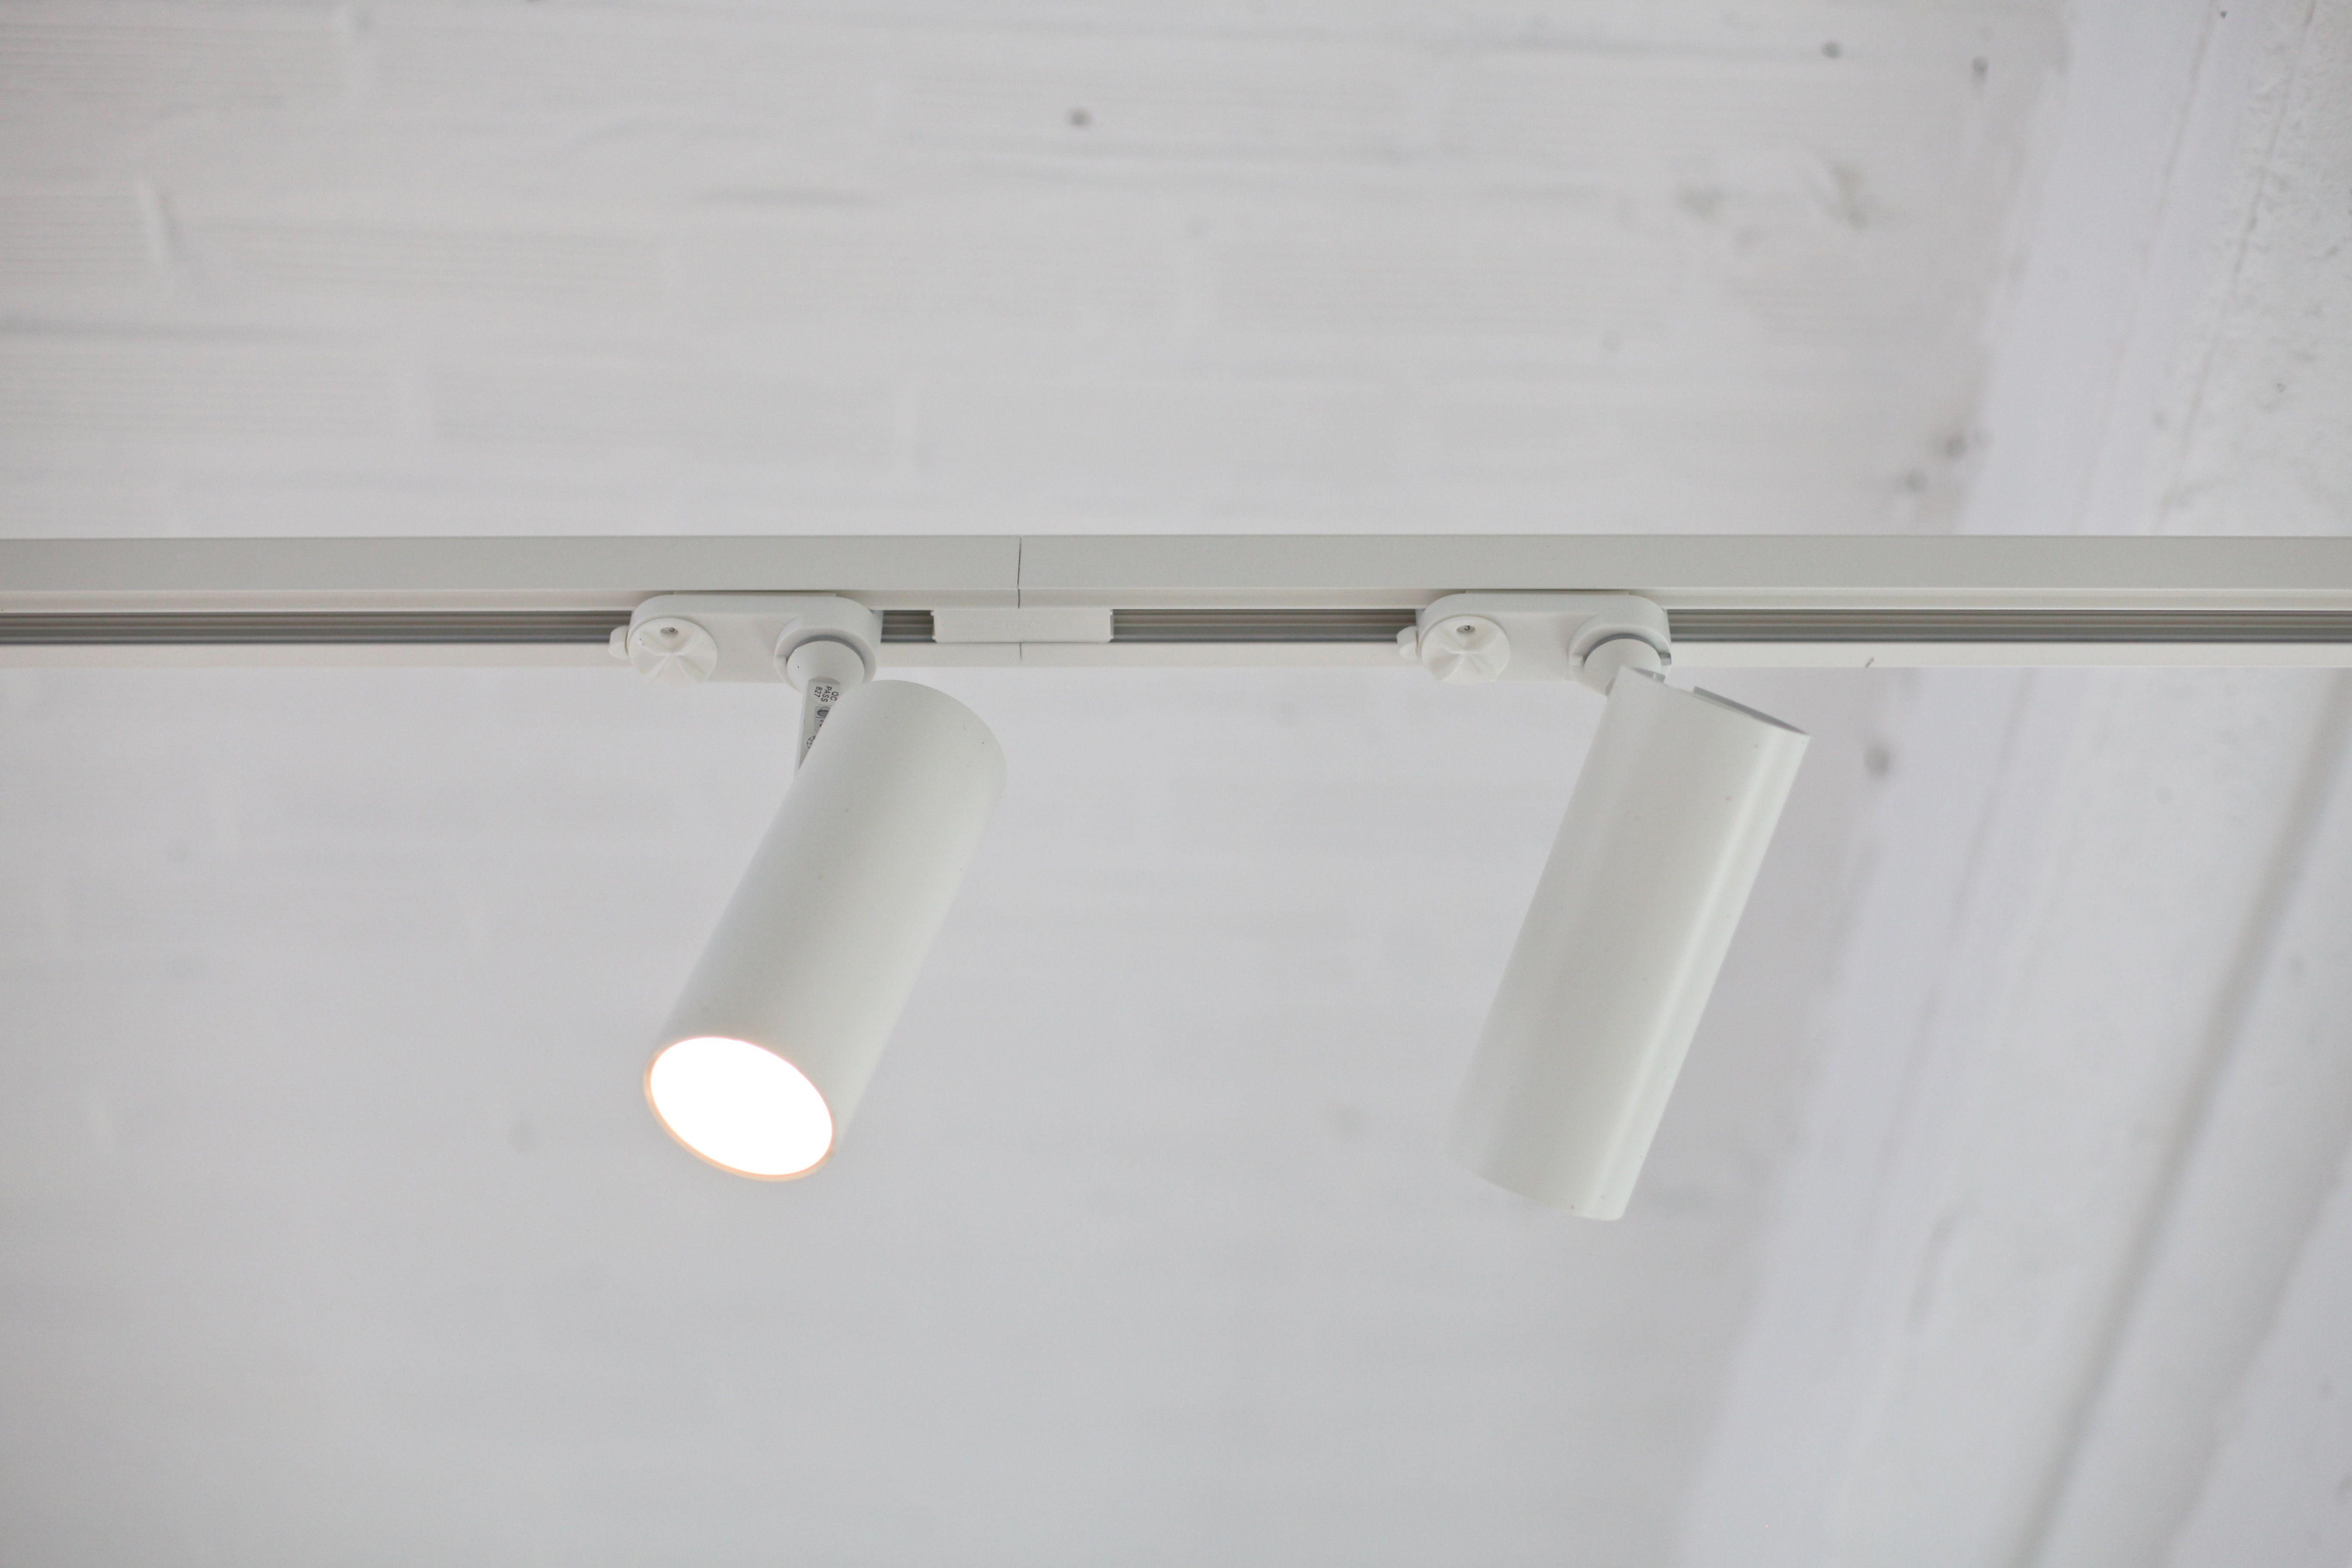 Tuki Dark Lighting Tuki Tukiontrack Track White Led Dark Darlings Design Dark Be Retail Lighting Track Lighting Fixtures Led Light Design